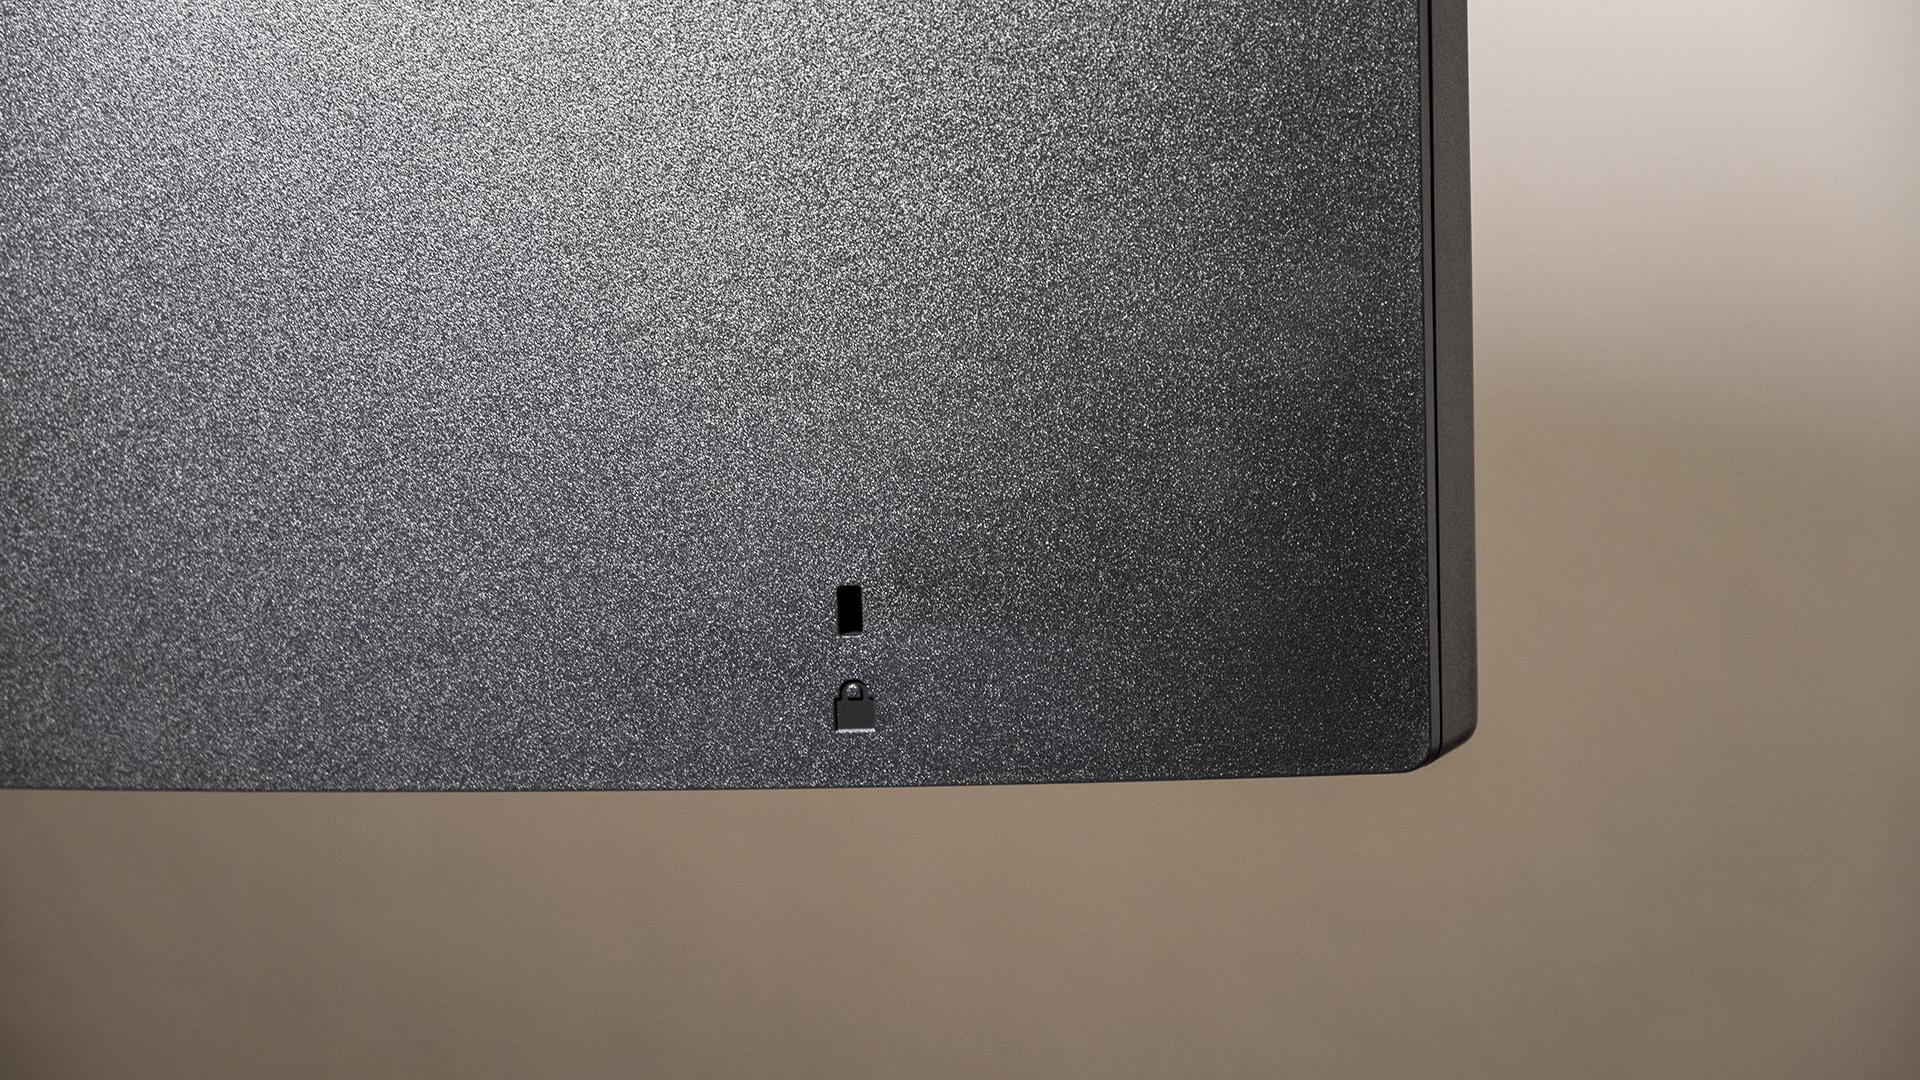 ViewSonic VP3481 ColorPro Monitor Kensington Lock